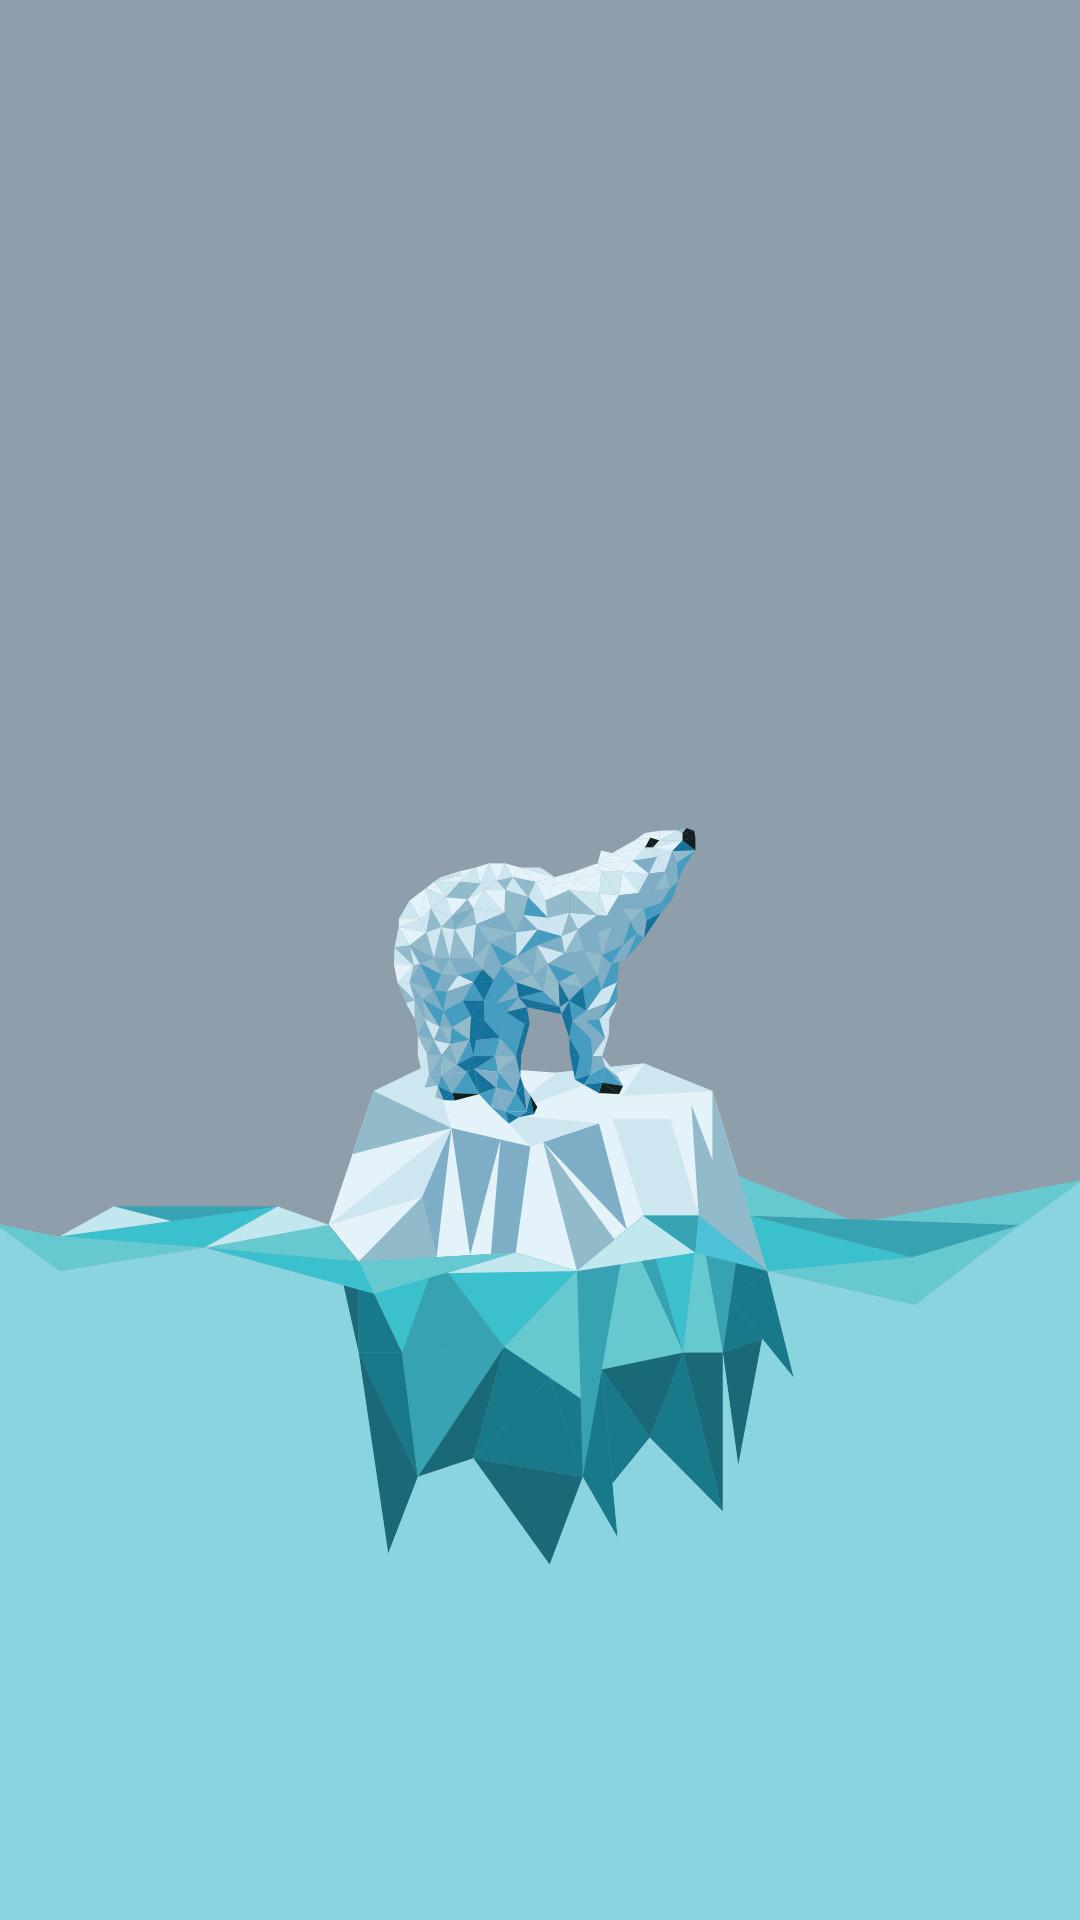 1080x1920, Minimal Iphone Wallpaper ¤ Polar Bear - Polar Bear Wallpaper Iphone - HD Wallpaper